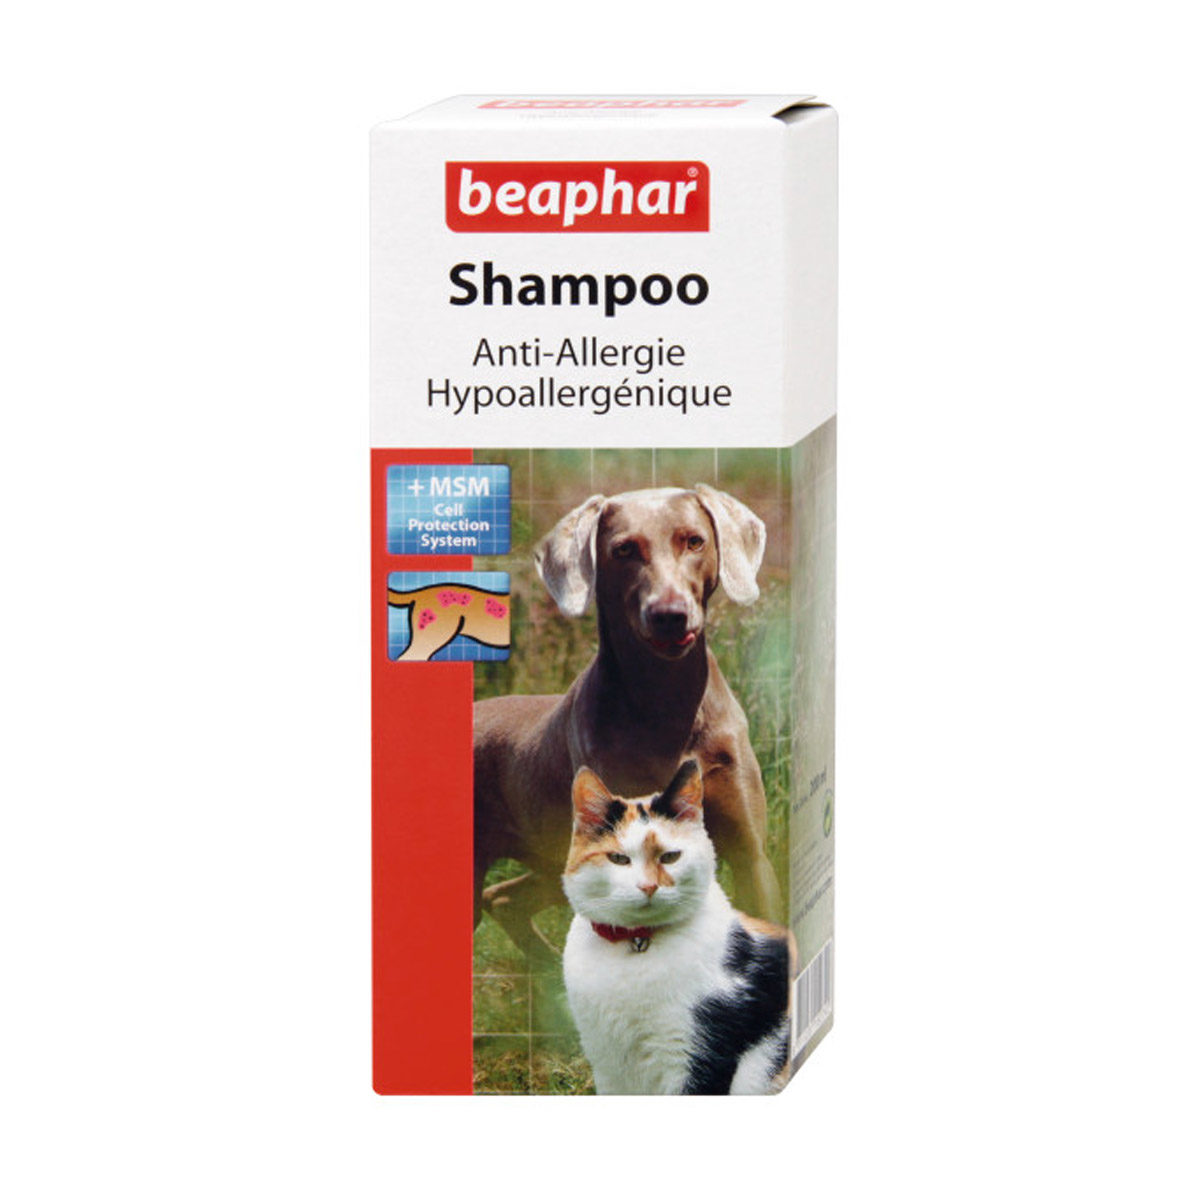 Beaphar Shampoo Anti-Allergie 200ml